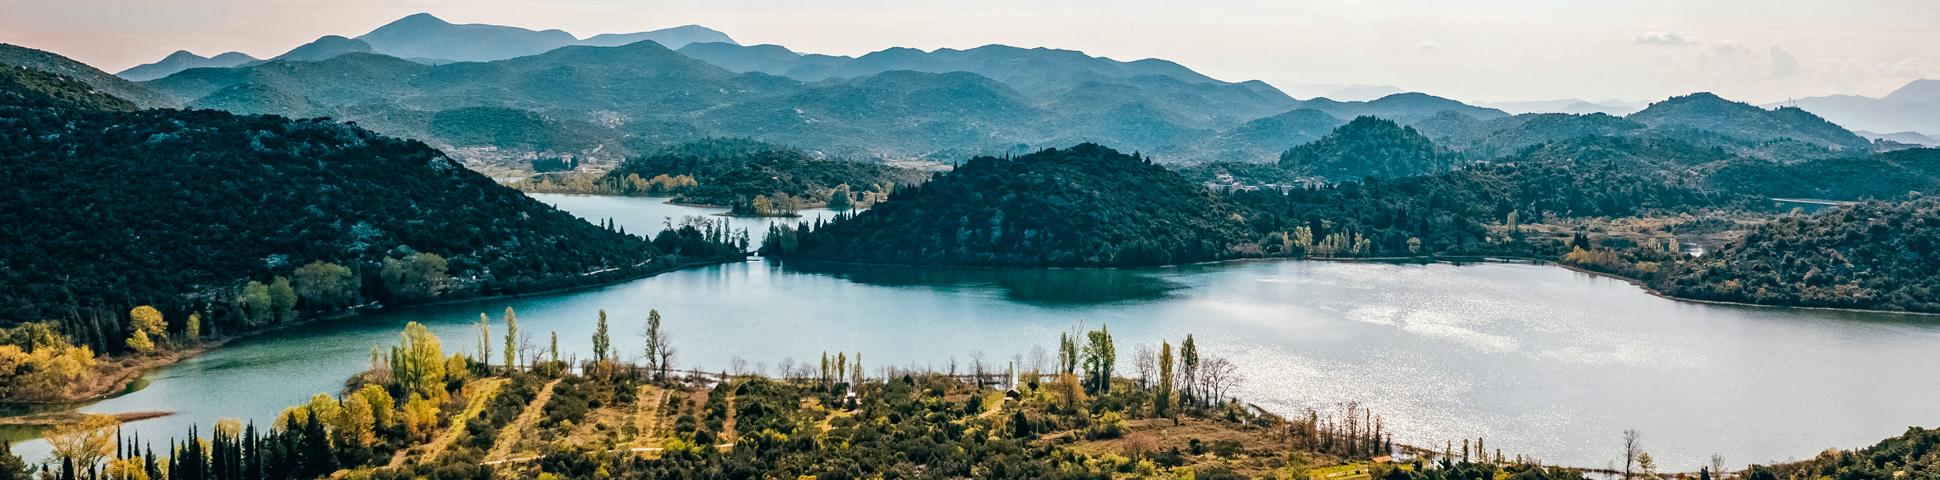 Panoramic view from Croatia Trekking Tour from Split to Dubrovnik